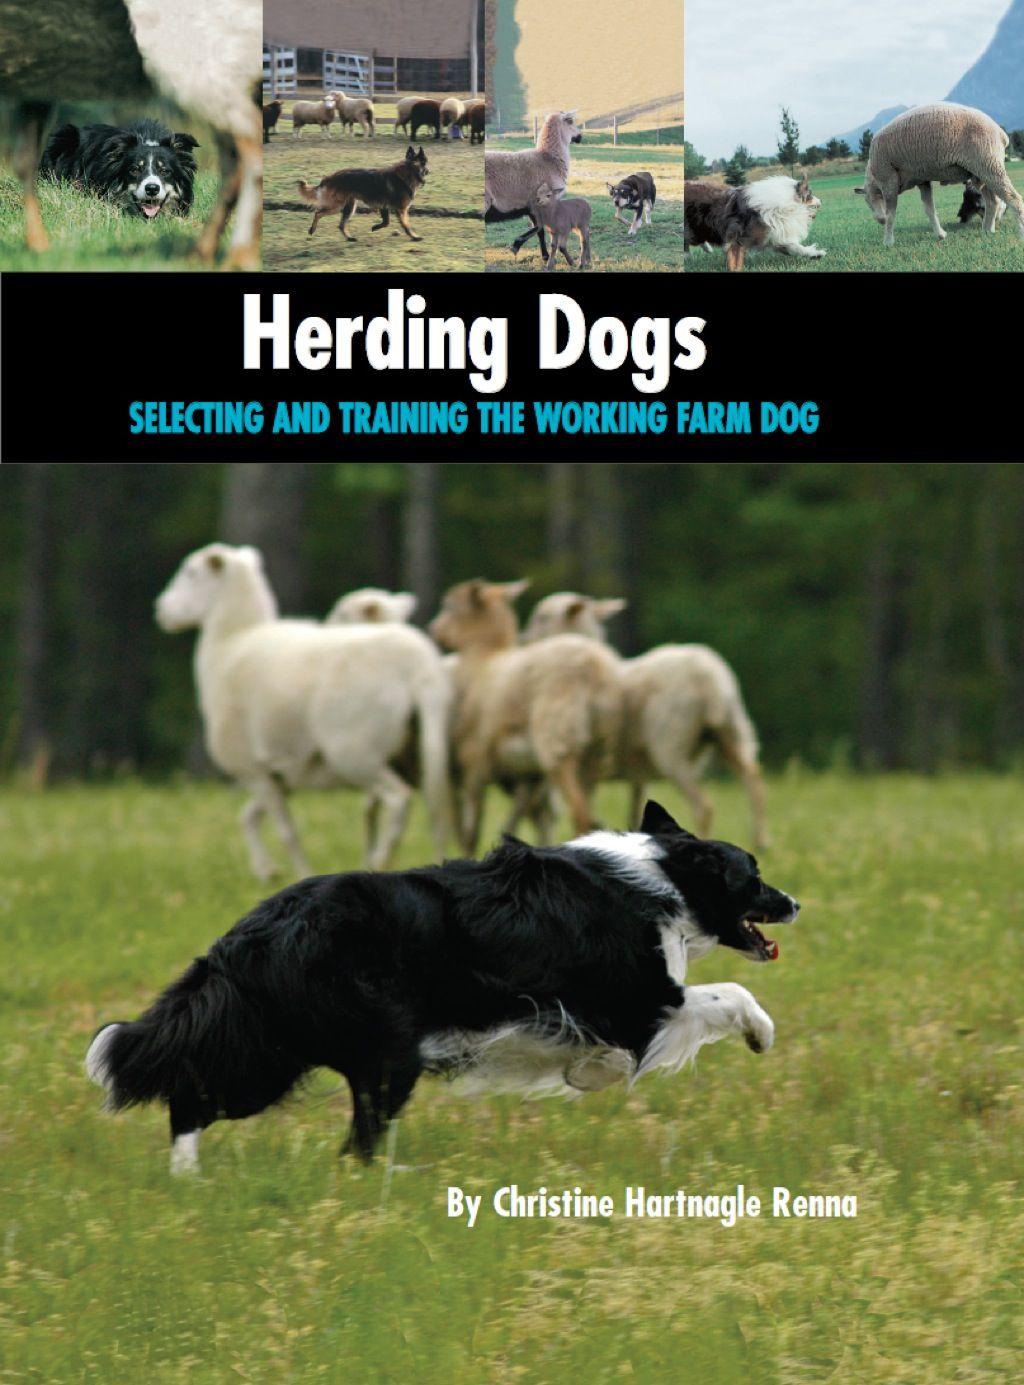 Herding Dogs Ebook In 2019 Herding Dogs Farm Dogs Dogs